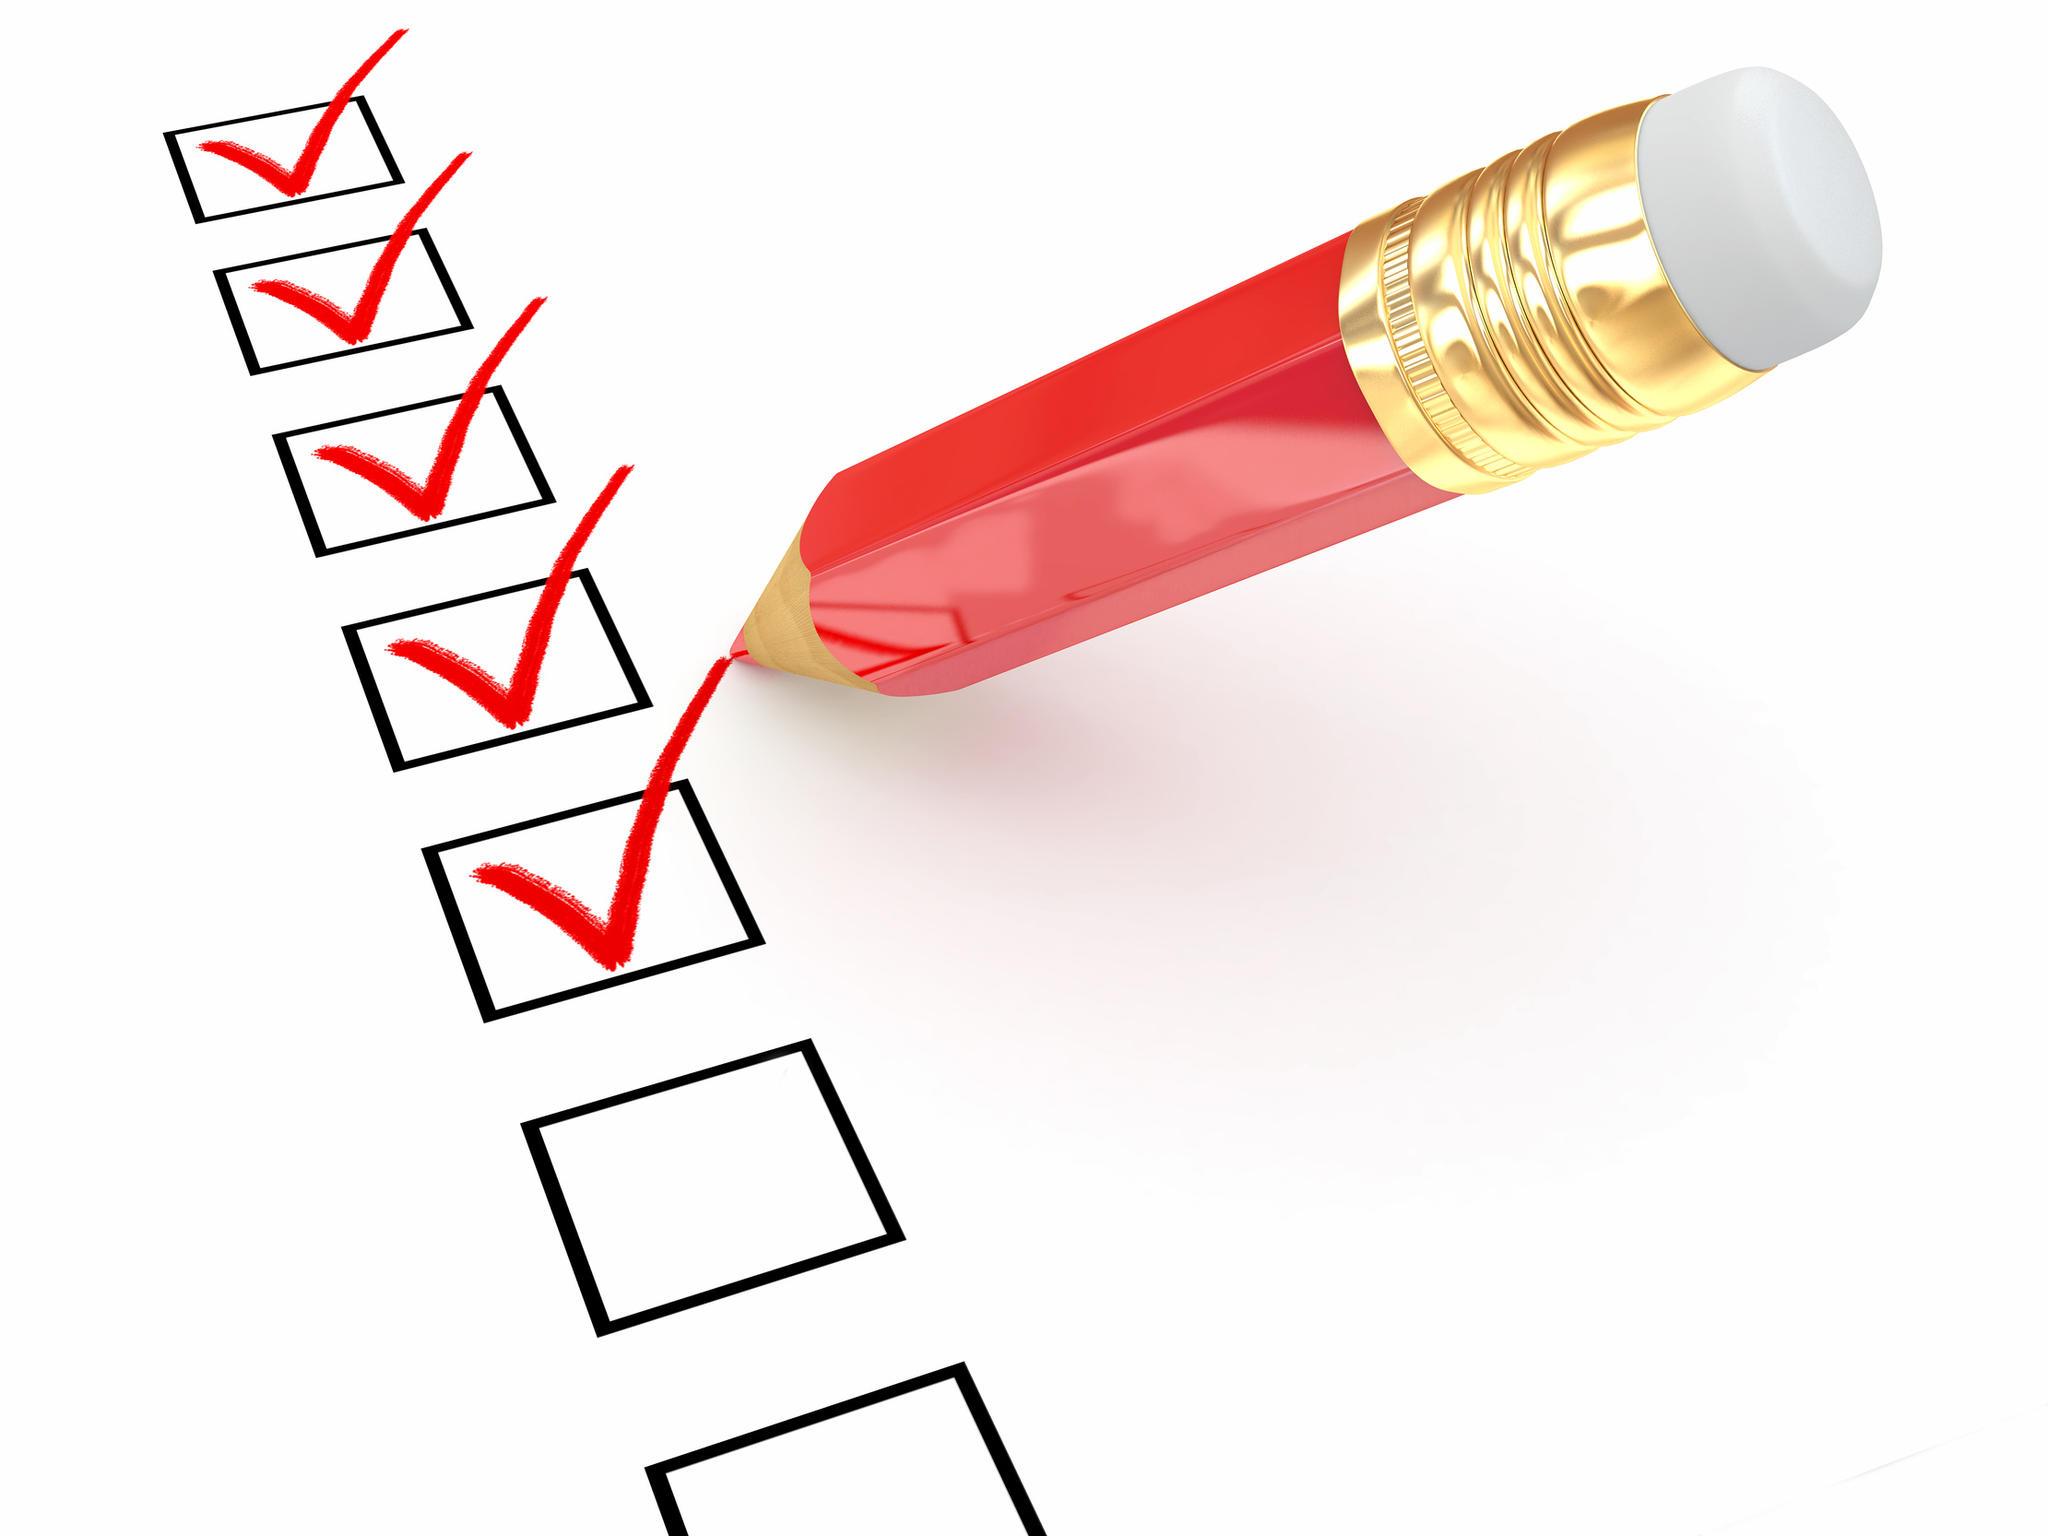 Kuesioner Pengguna Lulusan